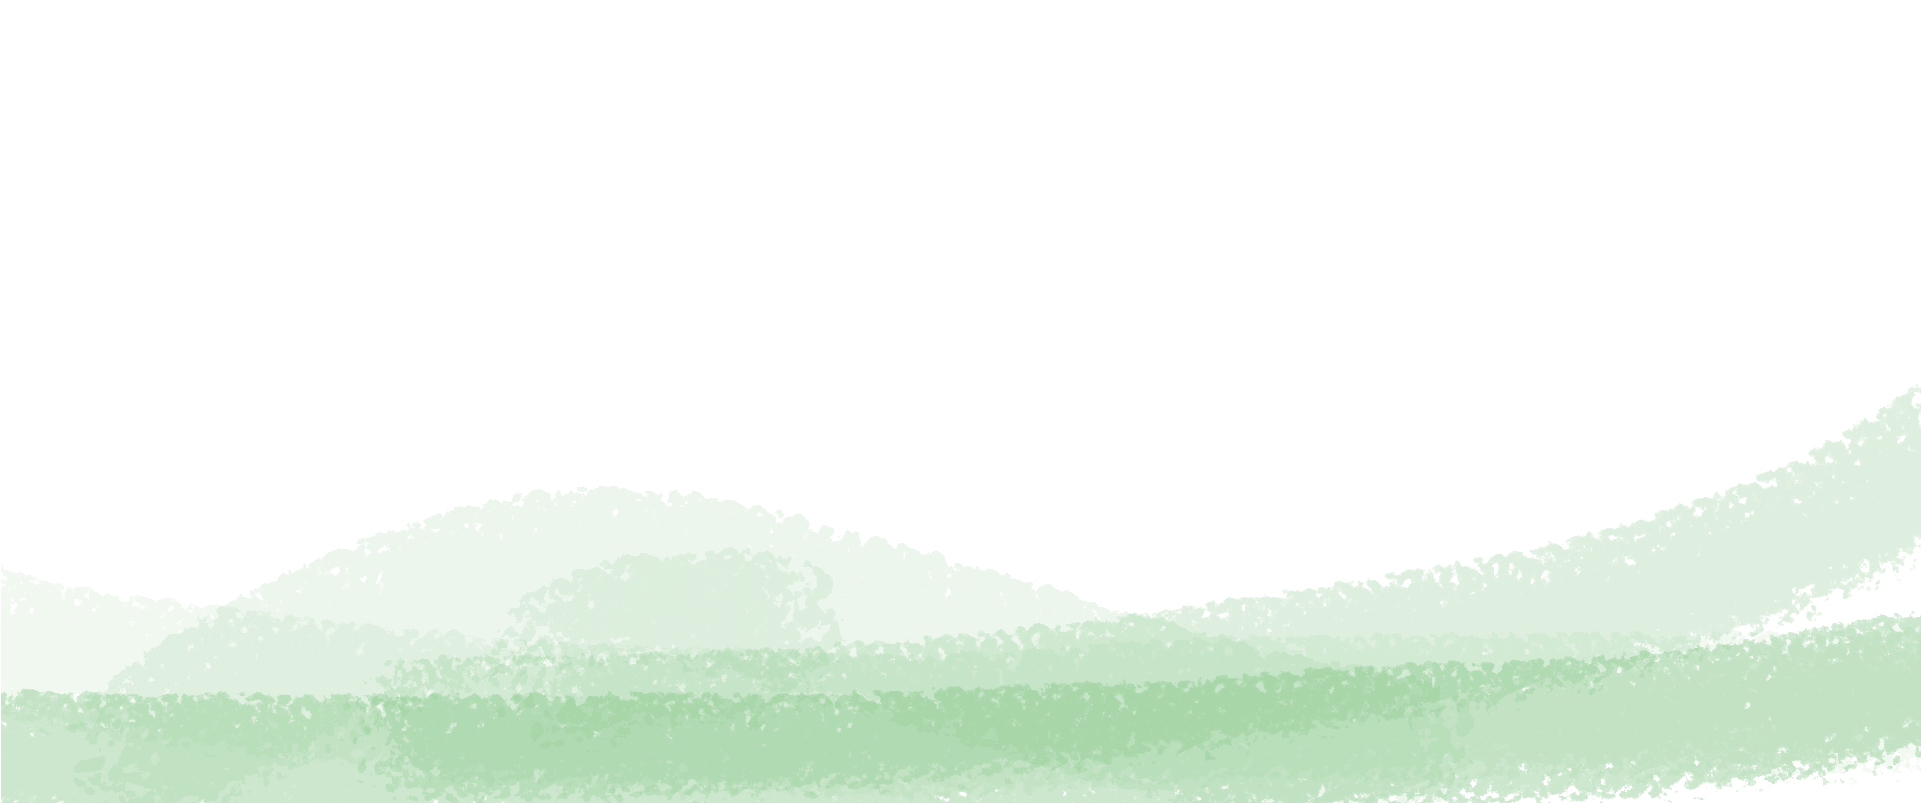 green-pastel-cta